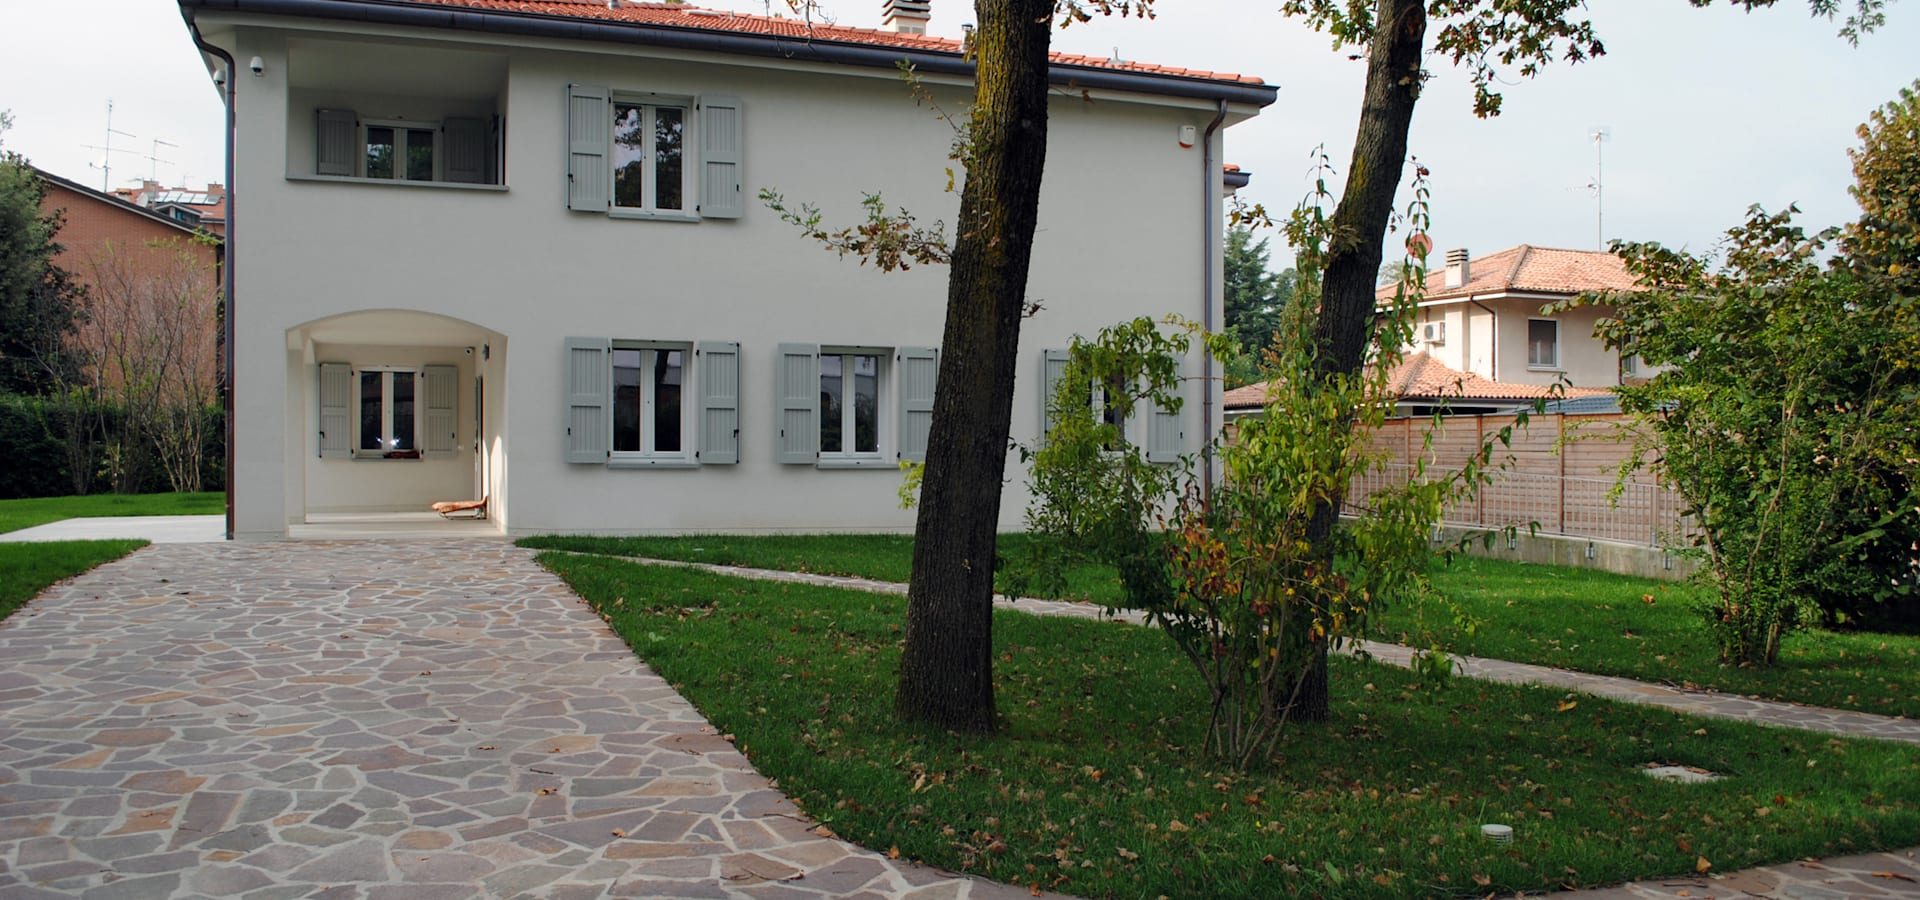 STUDIO498 Architettura